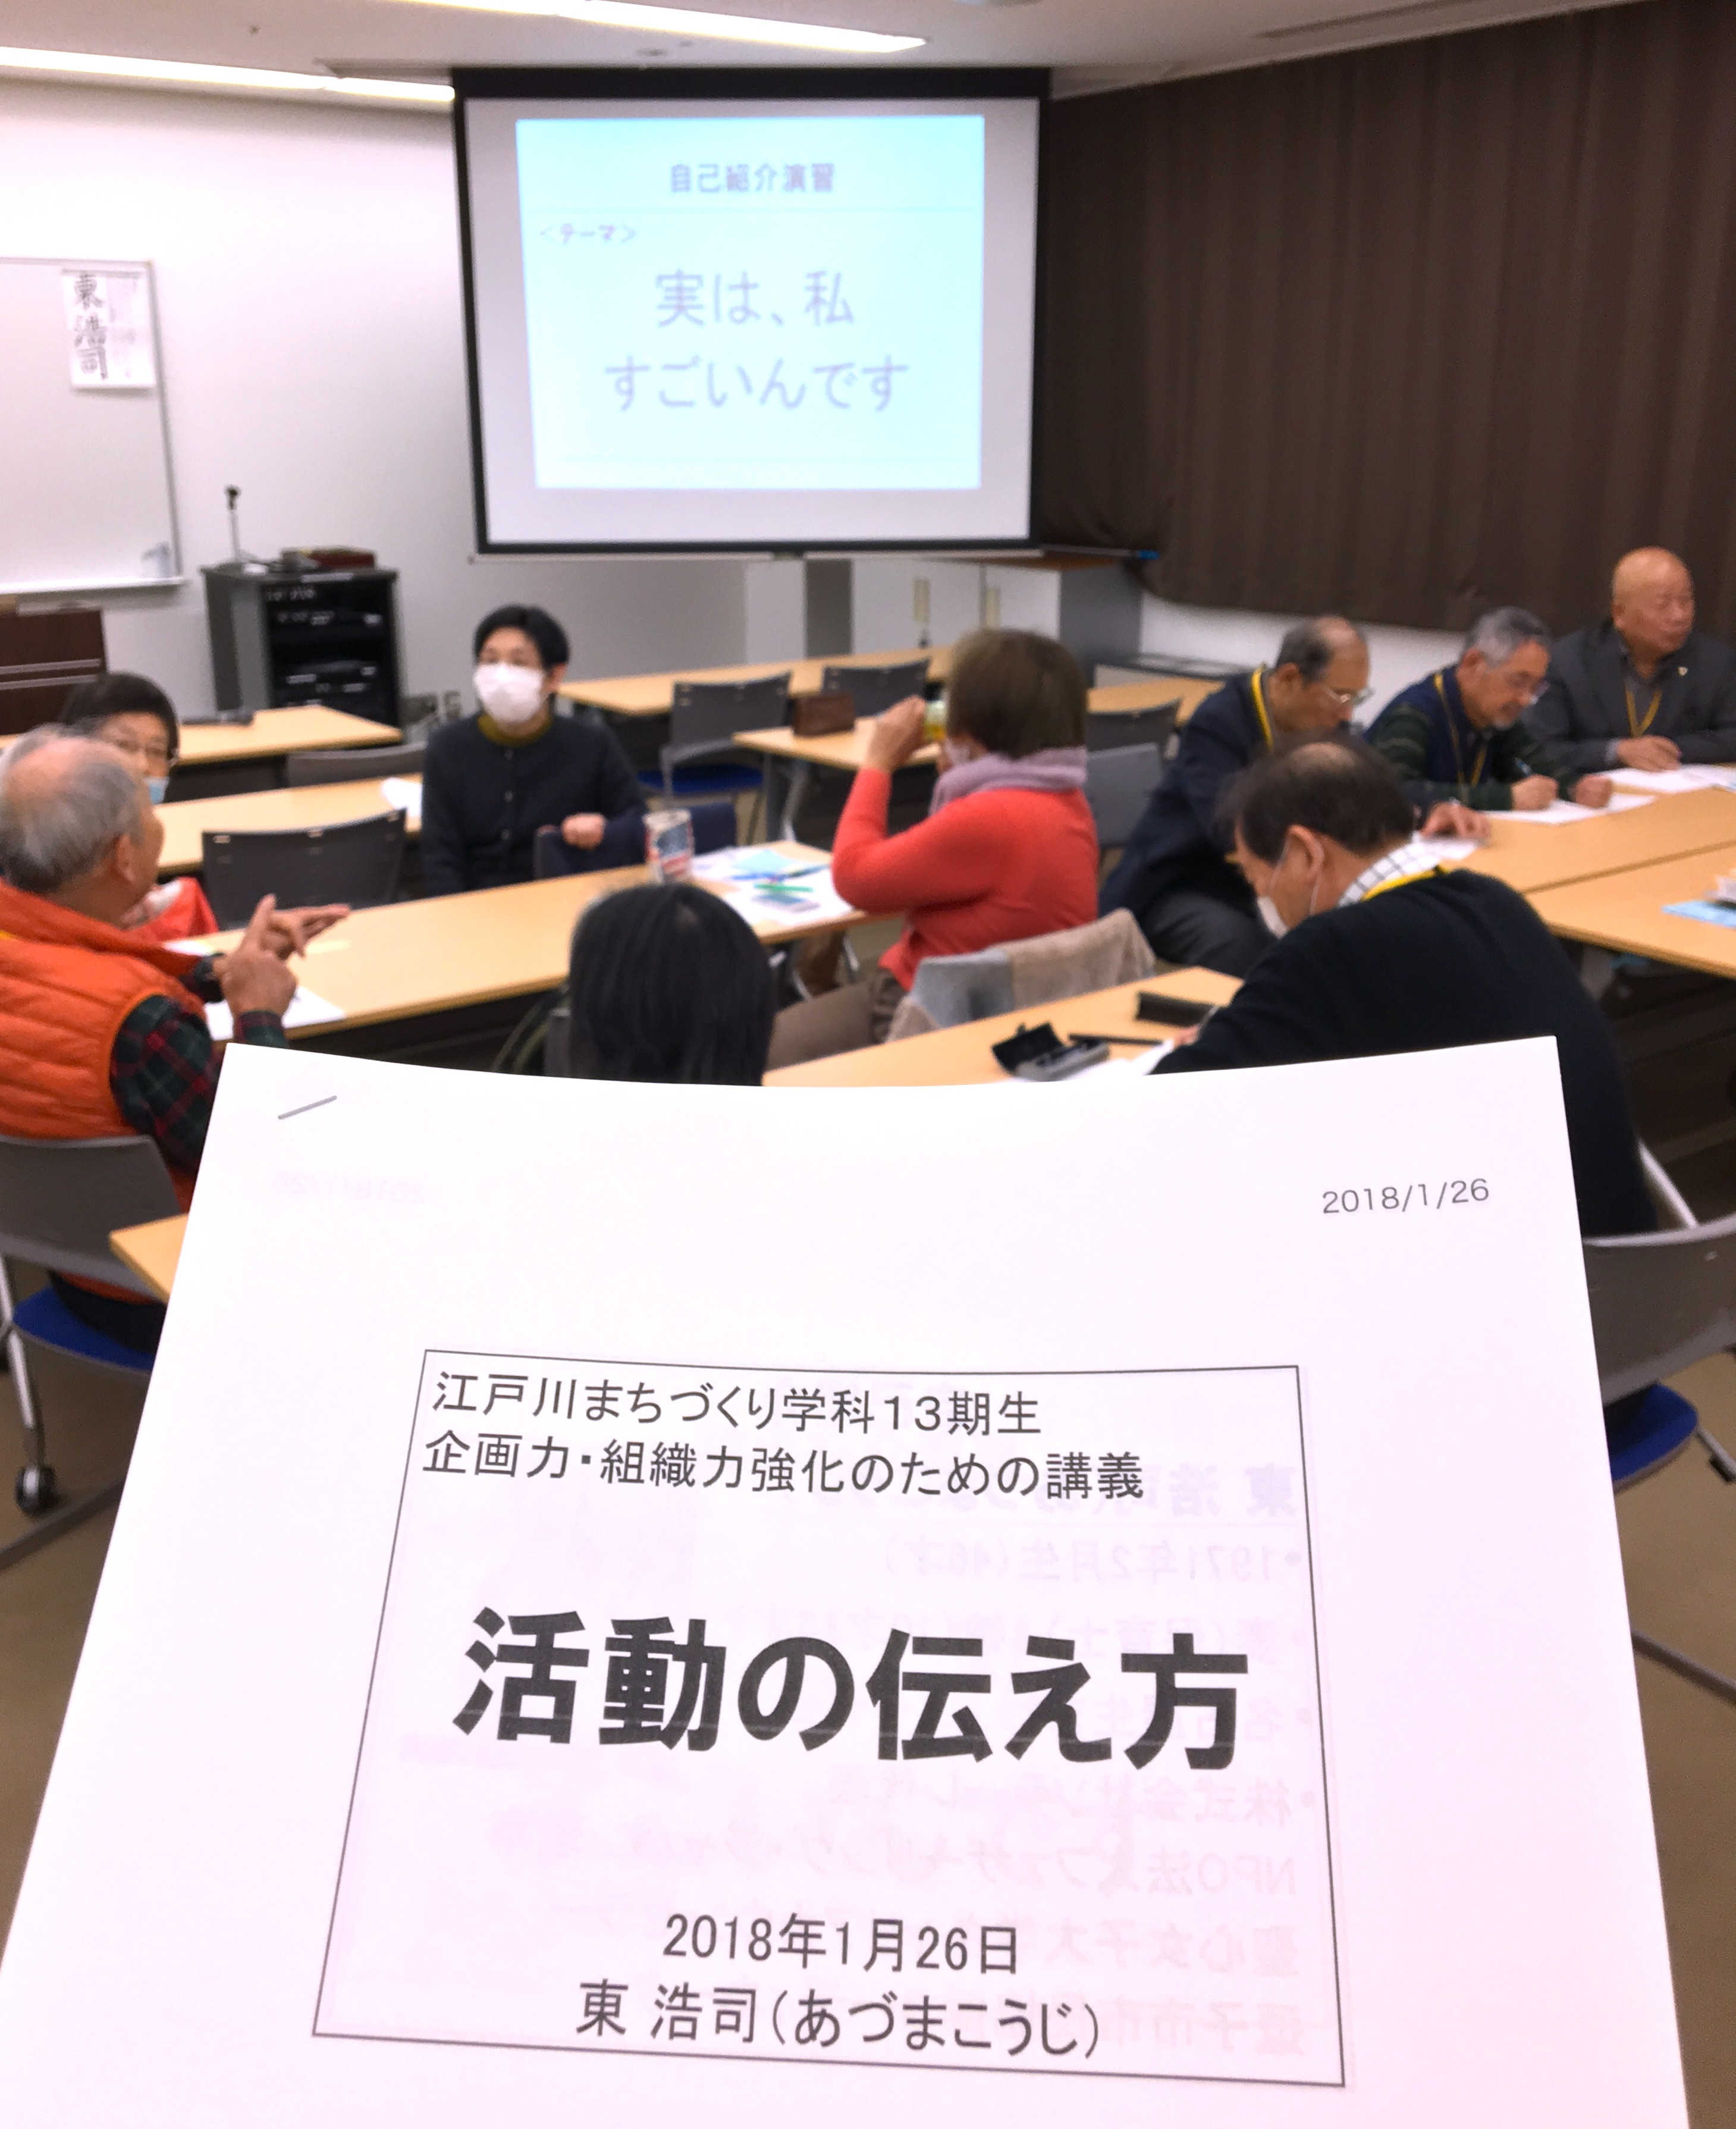 江戸川総合人生大学で今年も出番